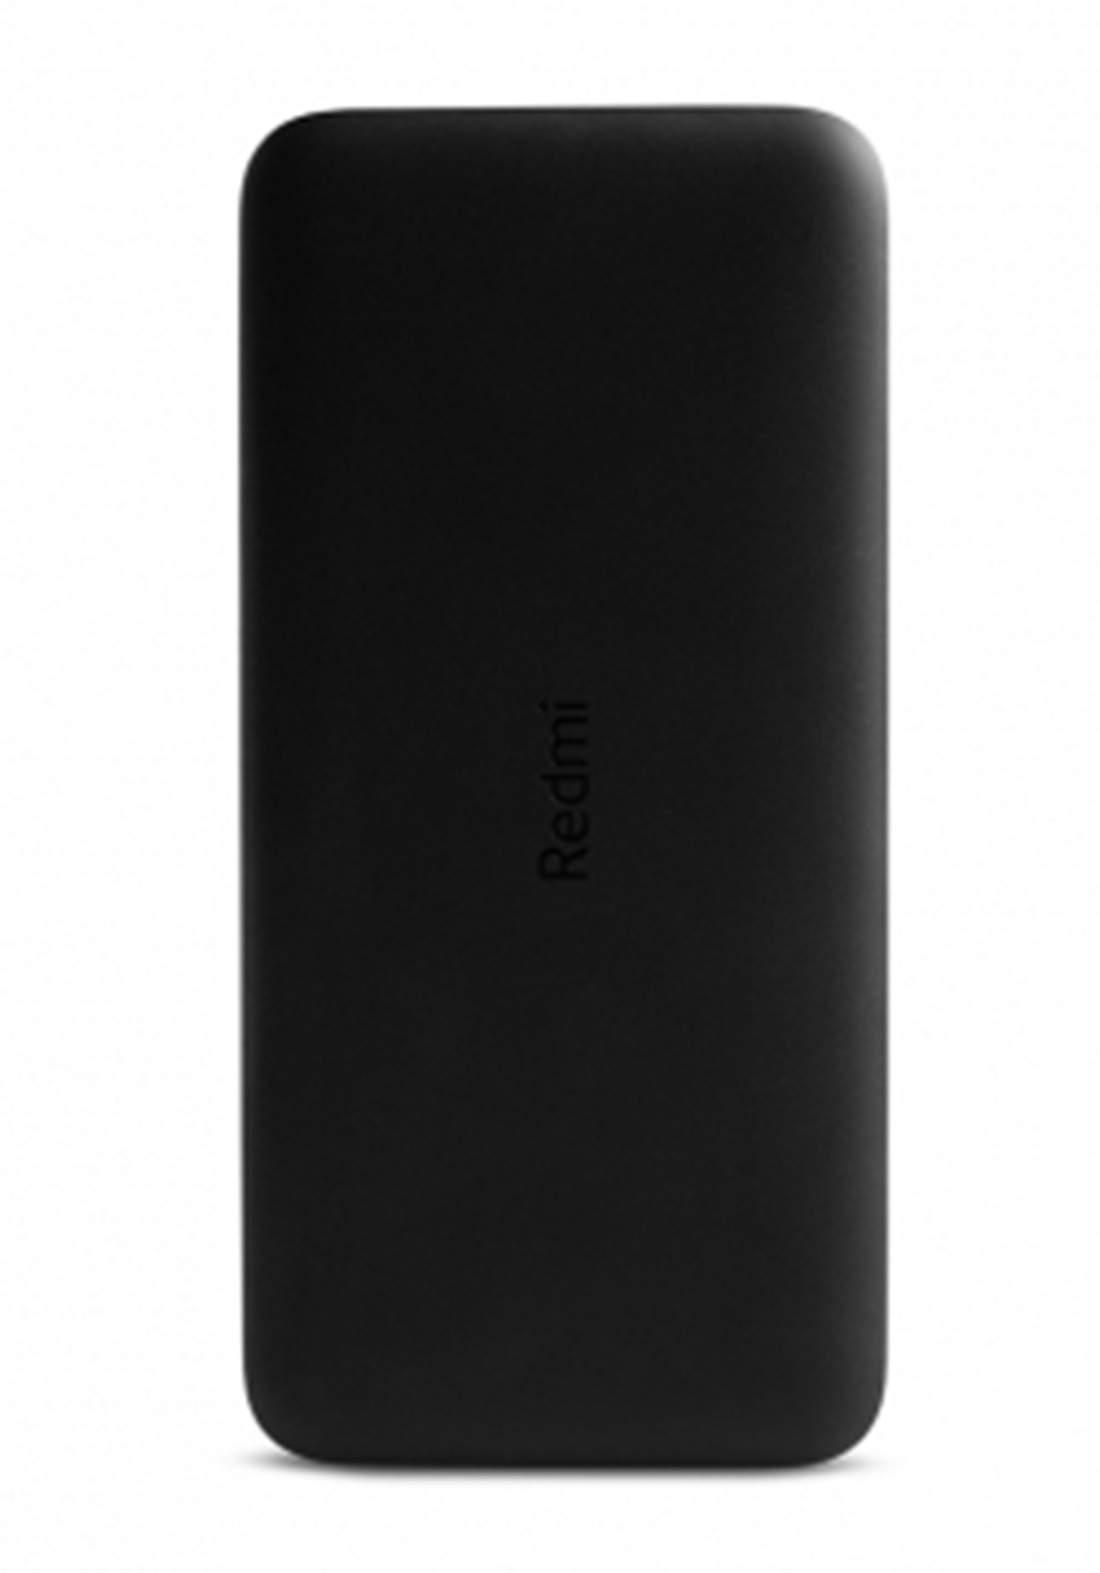 Xiaomi Redmi  Fast Charging 20000mAh 18W Power Bank- Black